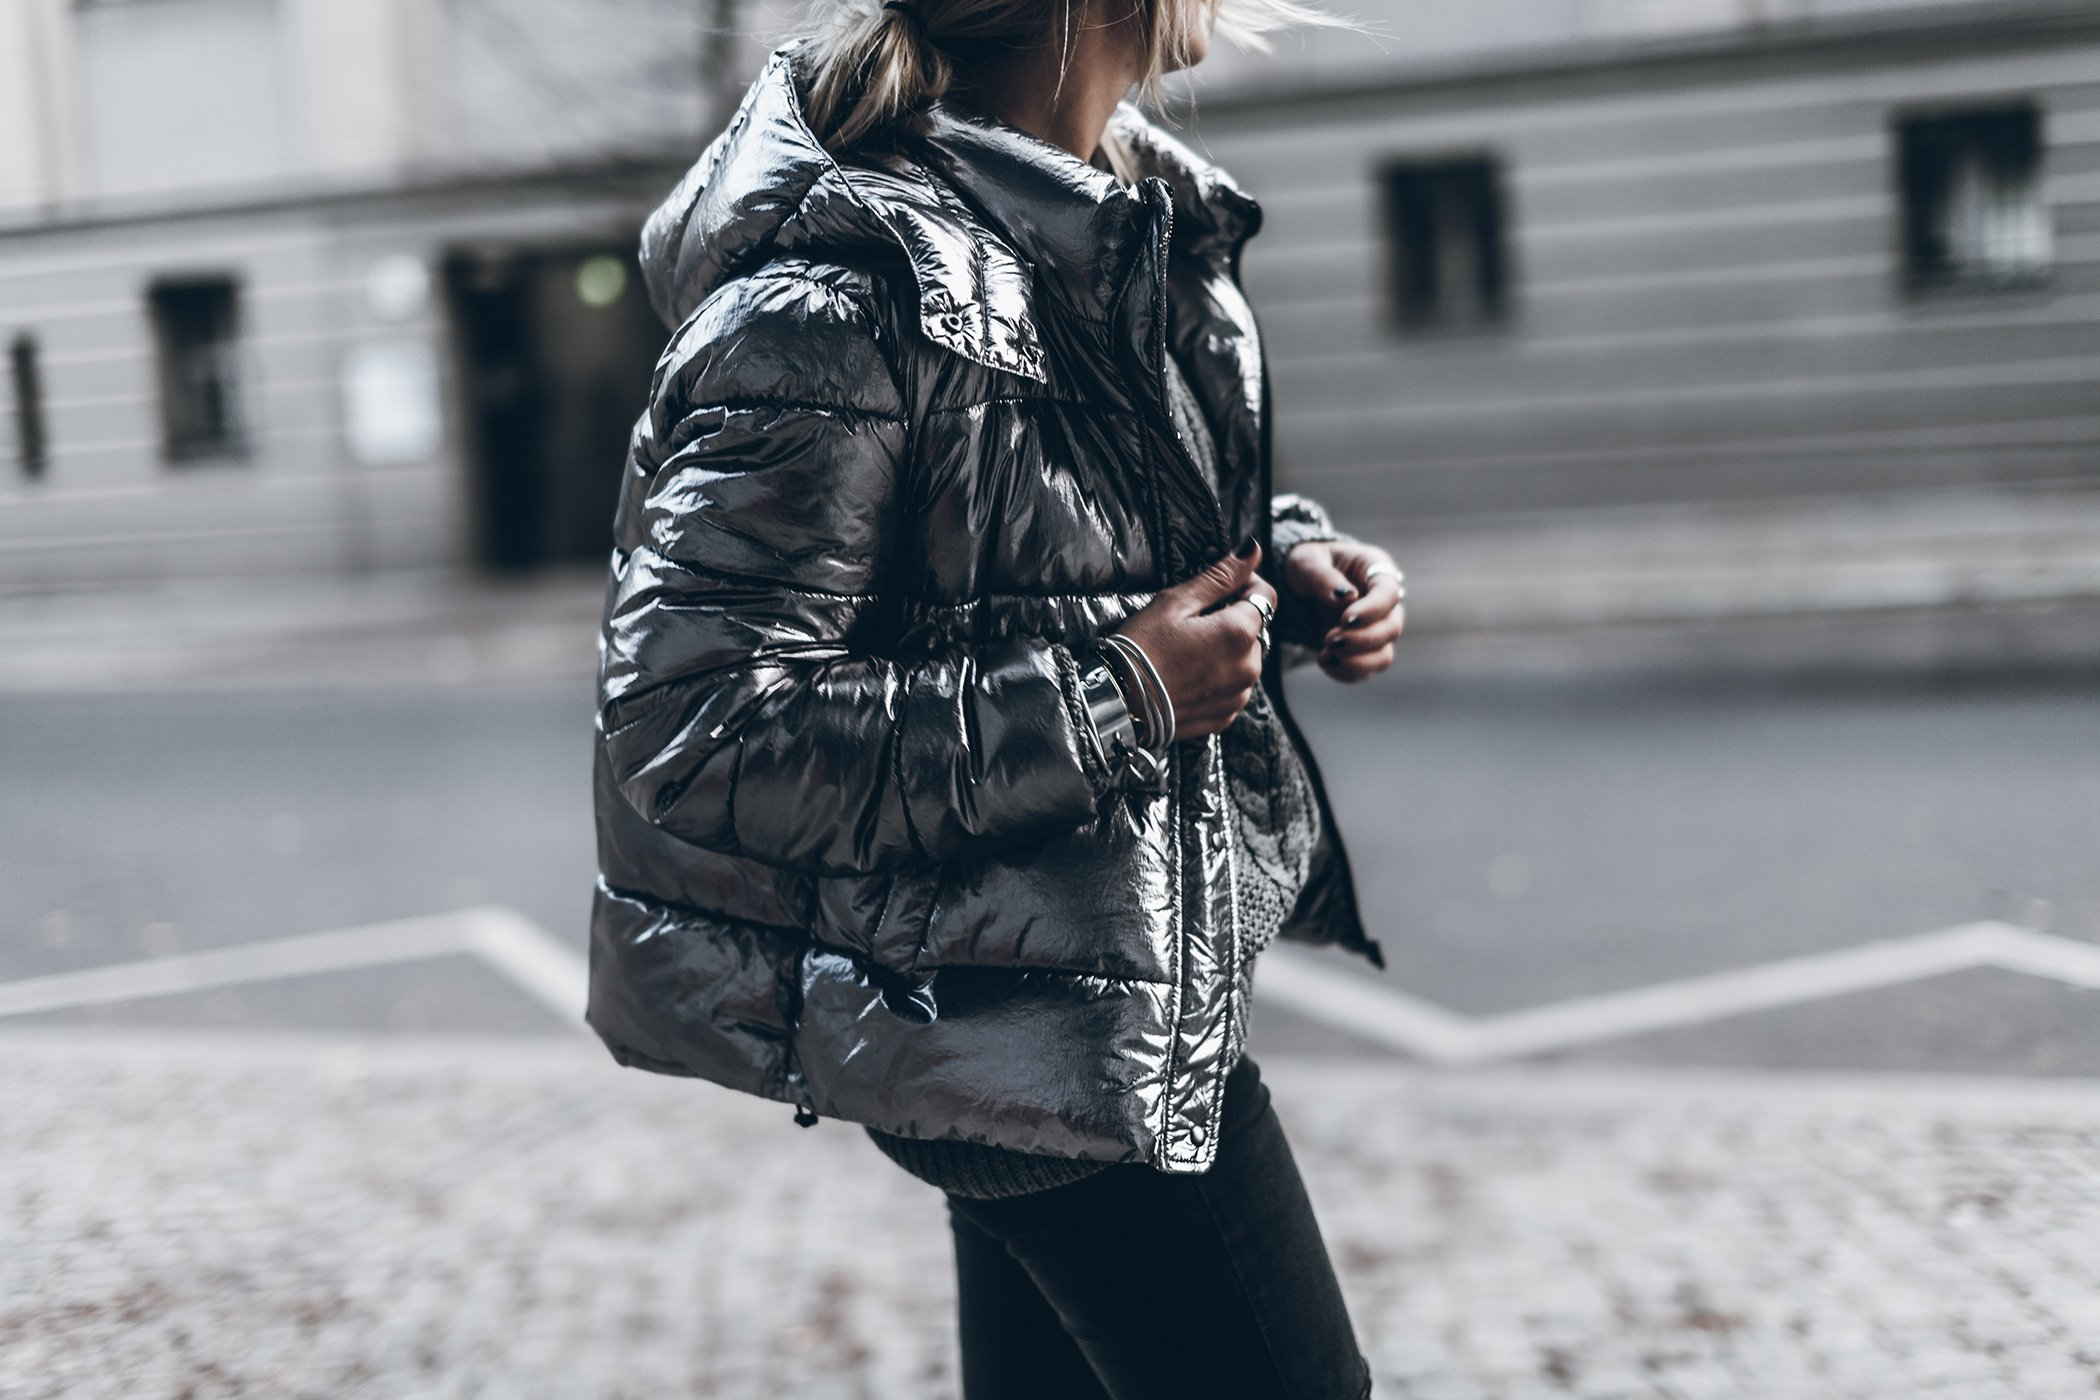 mikuta-silver-jacket-4